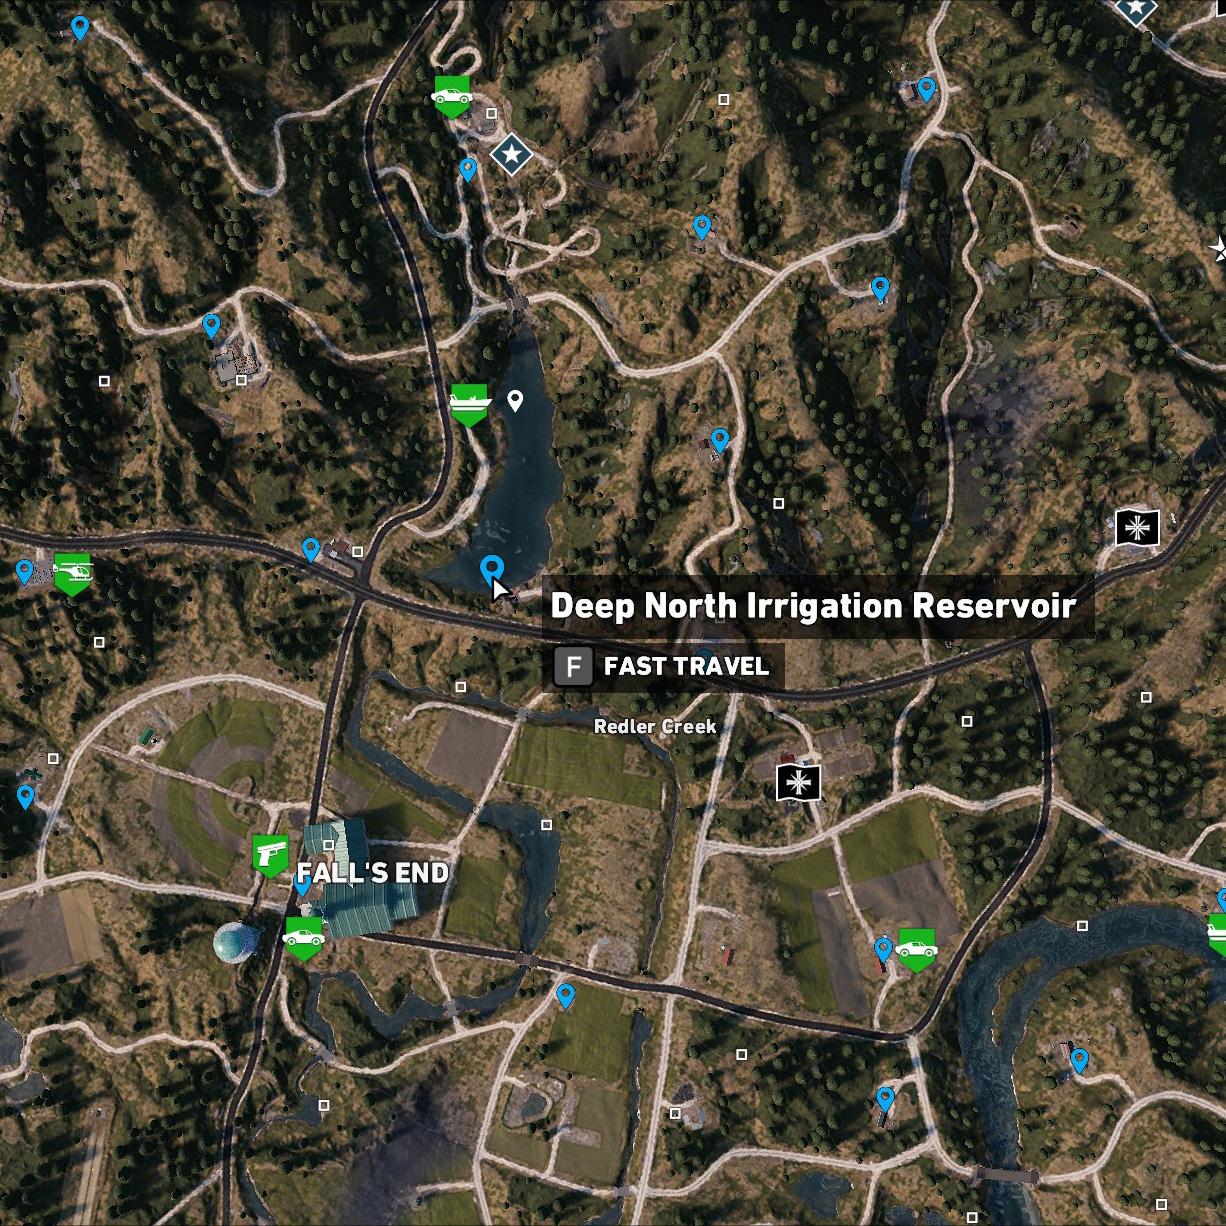 Deep North Irrigation Reservoir